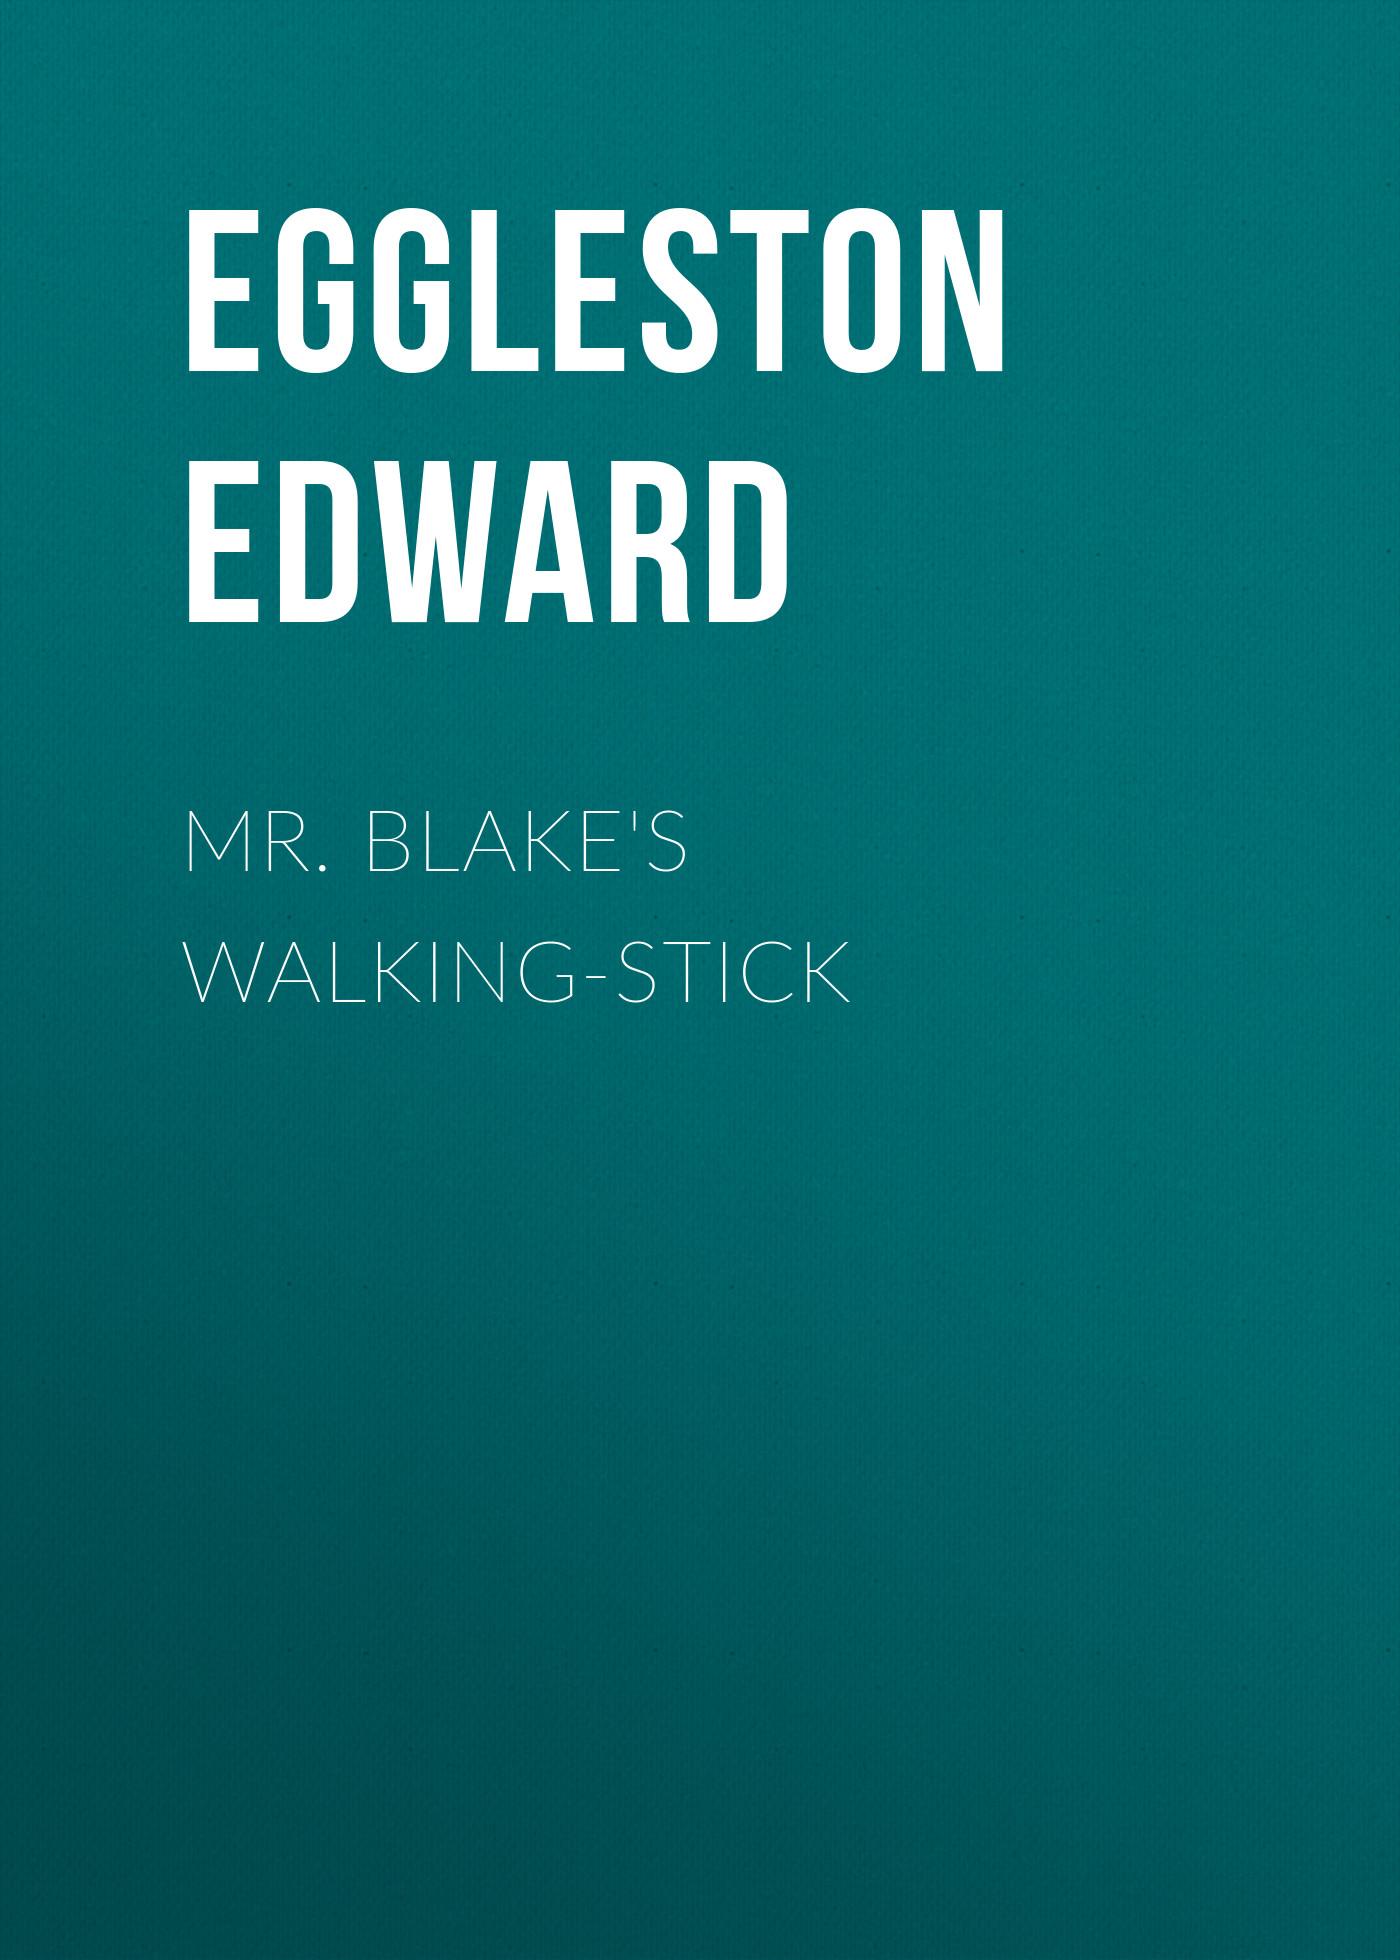 Eggleston Edward Mr. Blake's Walking-Stick цены онлайн